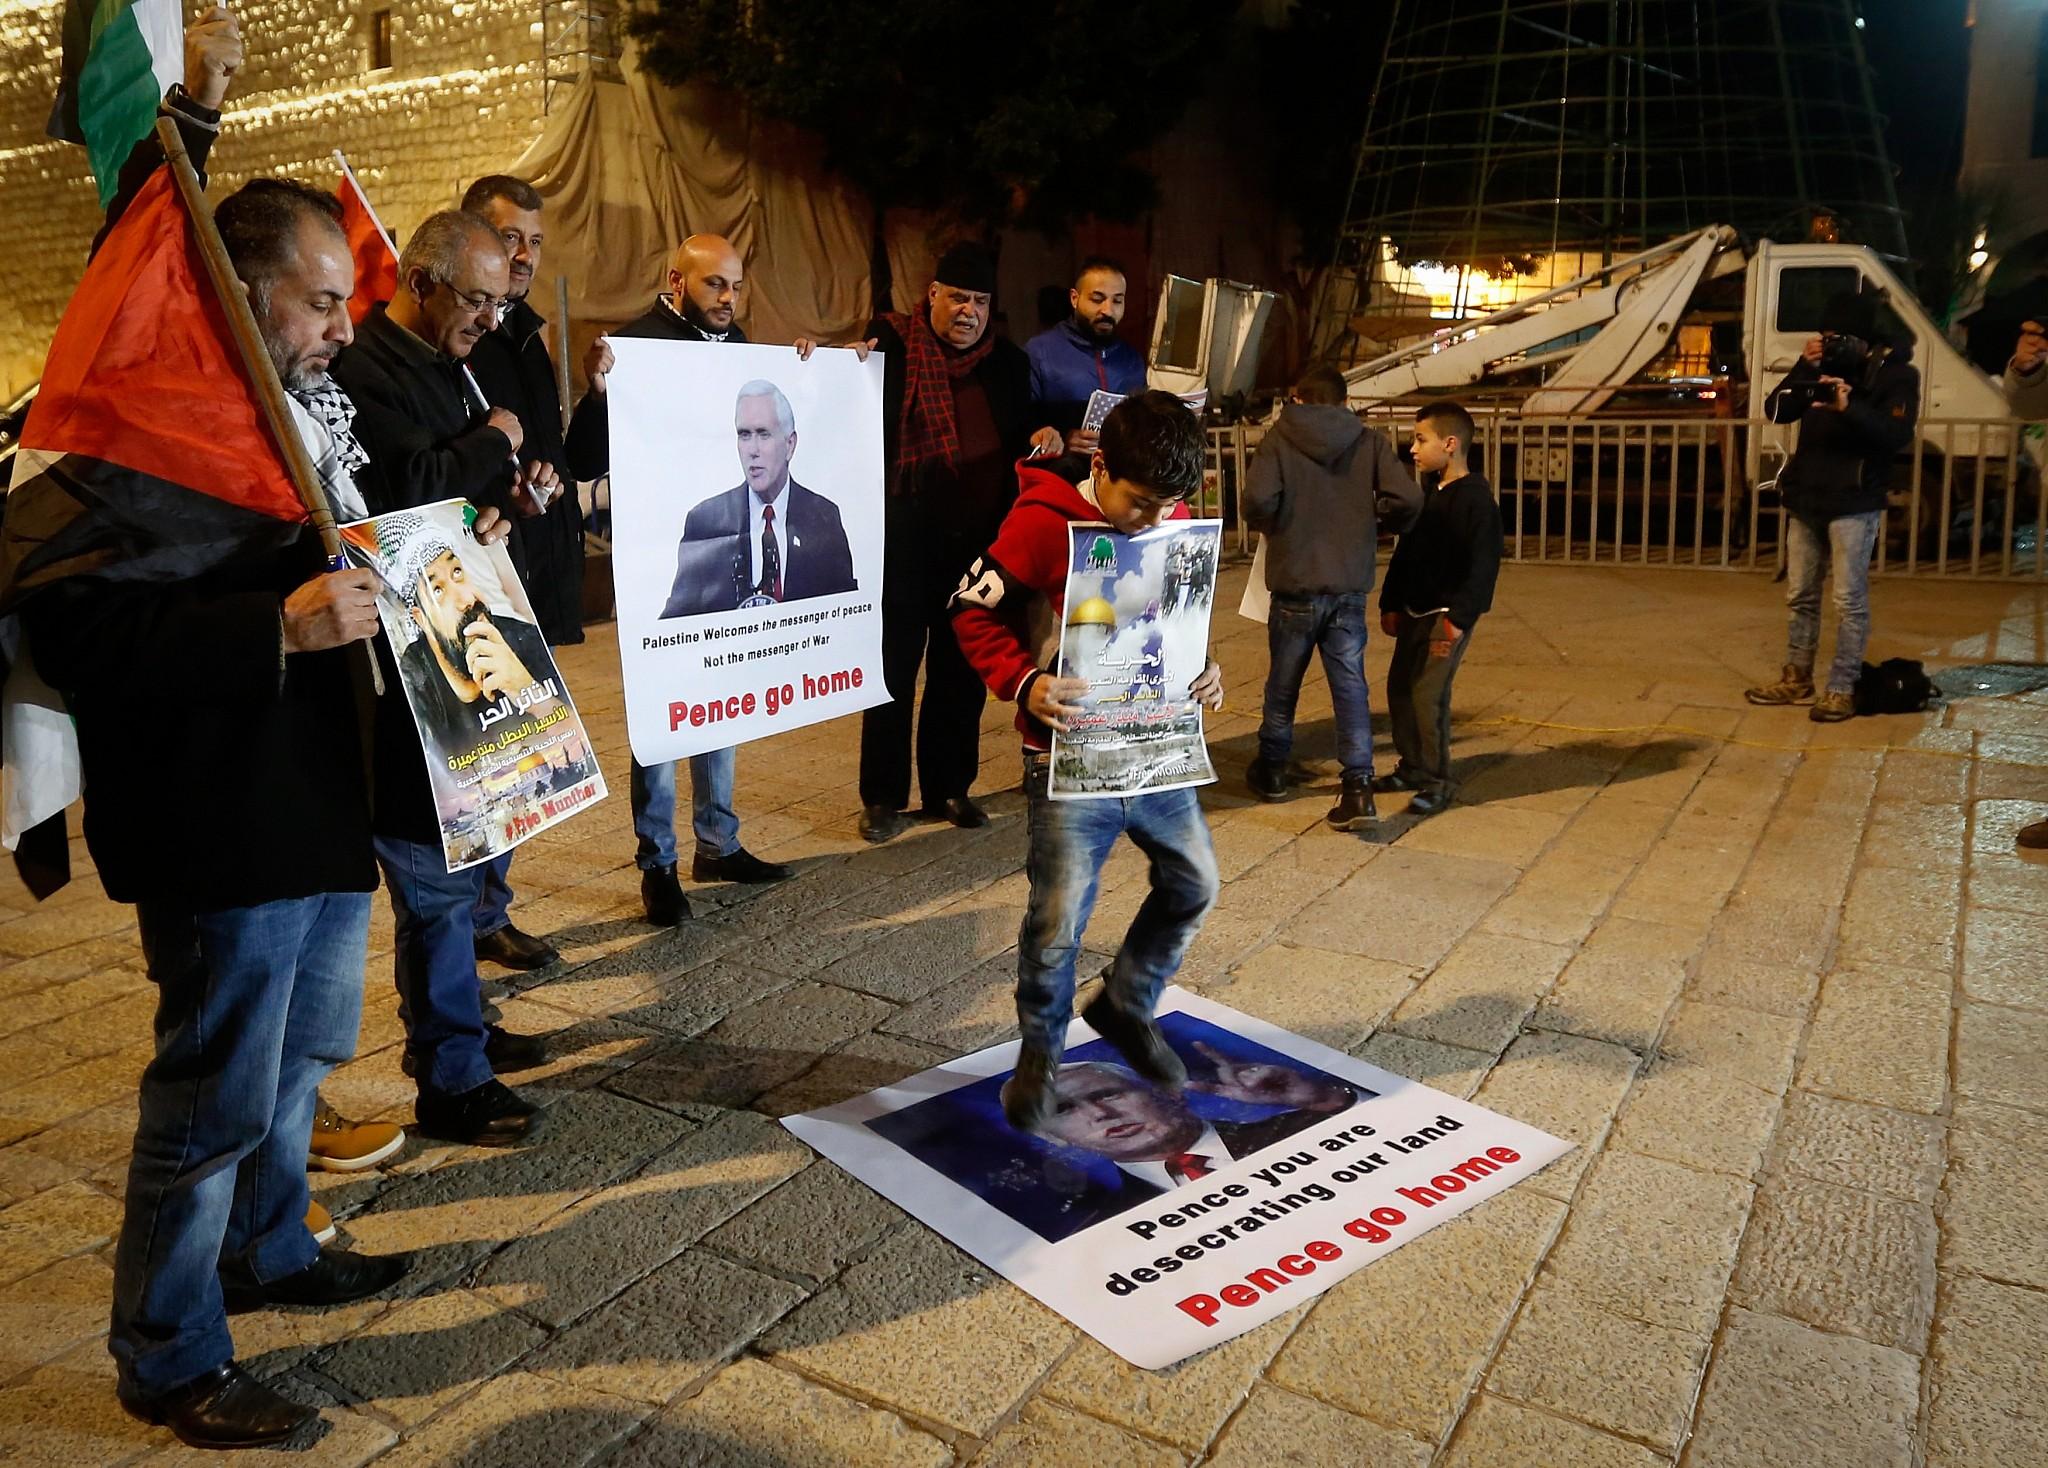 Palestinian Christians slam Pence's pro-Israel faith | The